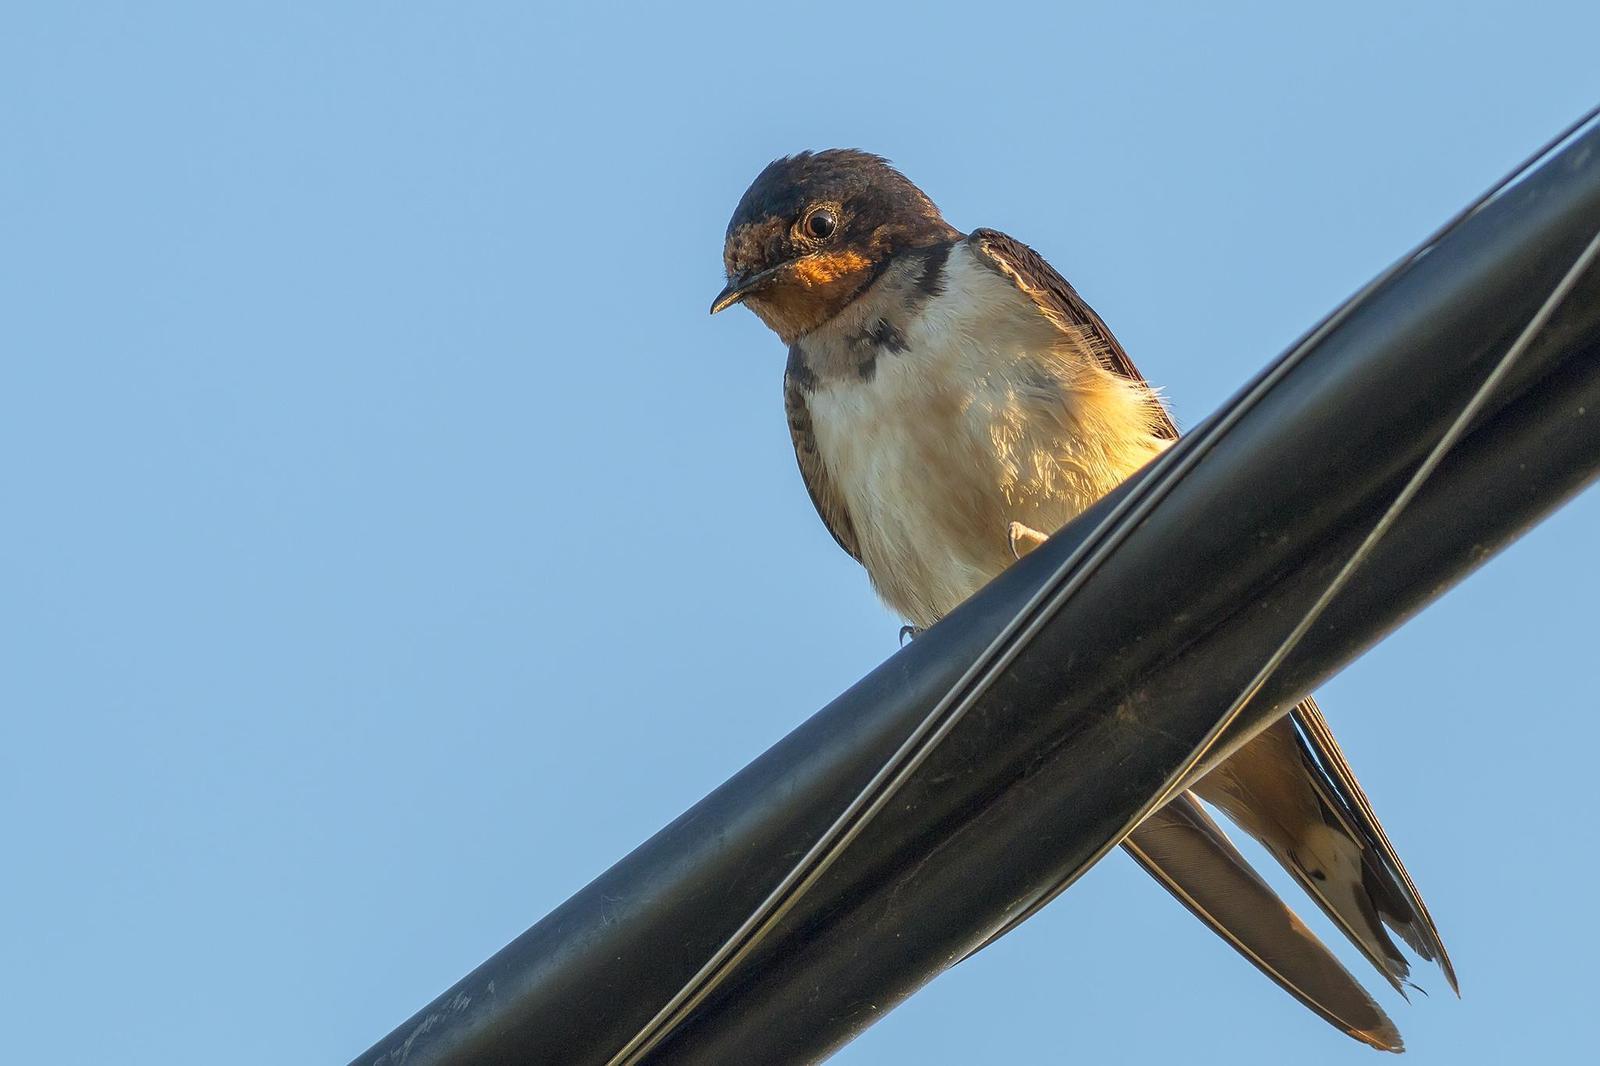 Barn Swallow Photo by Ryan Jones